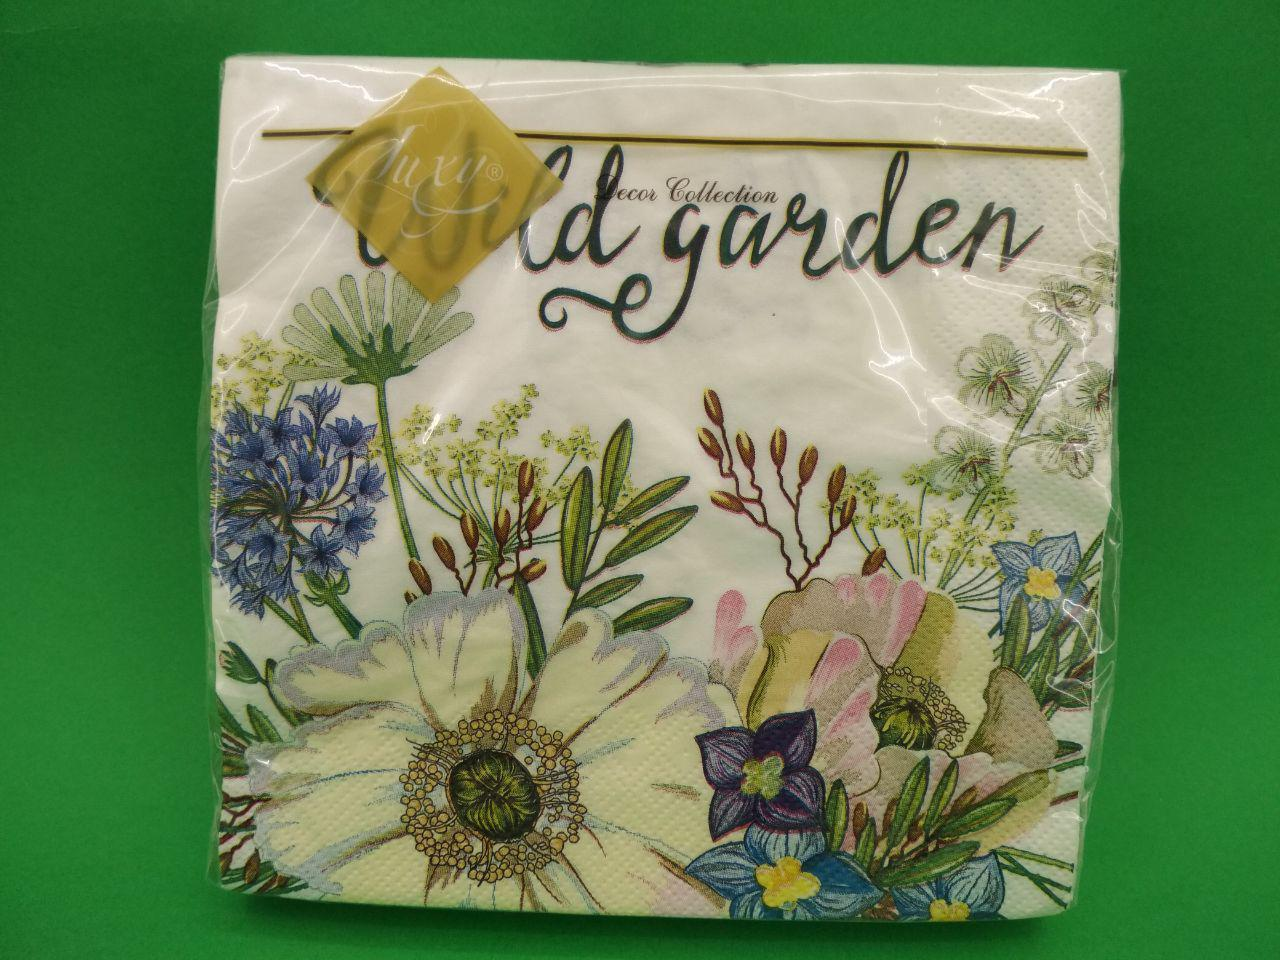 Салфетка (ЗЗхЗЗ, 20шт) Luxy  Нетронутый сад(1234) (1 пач)